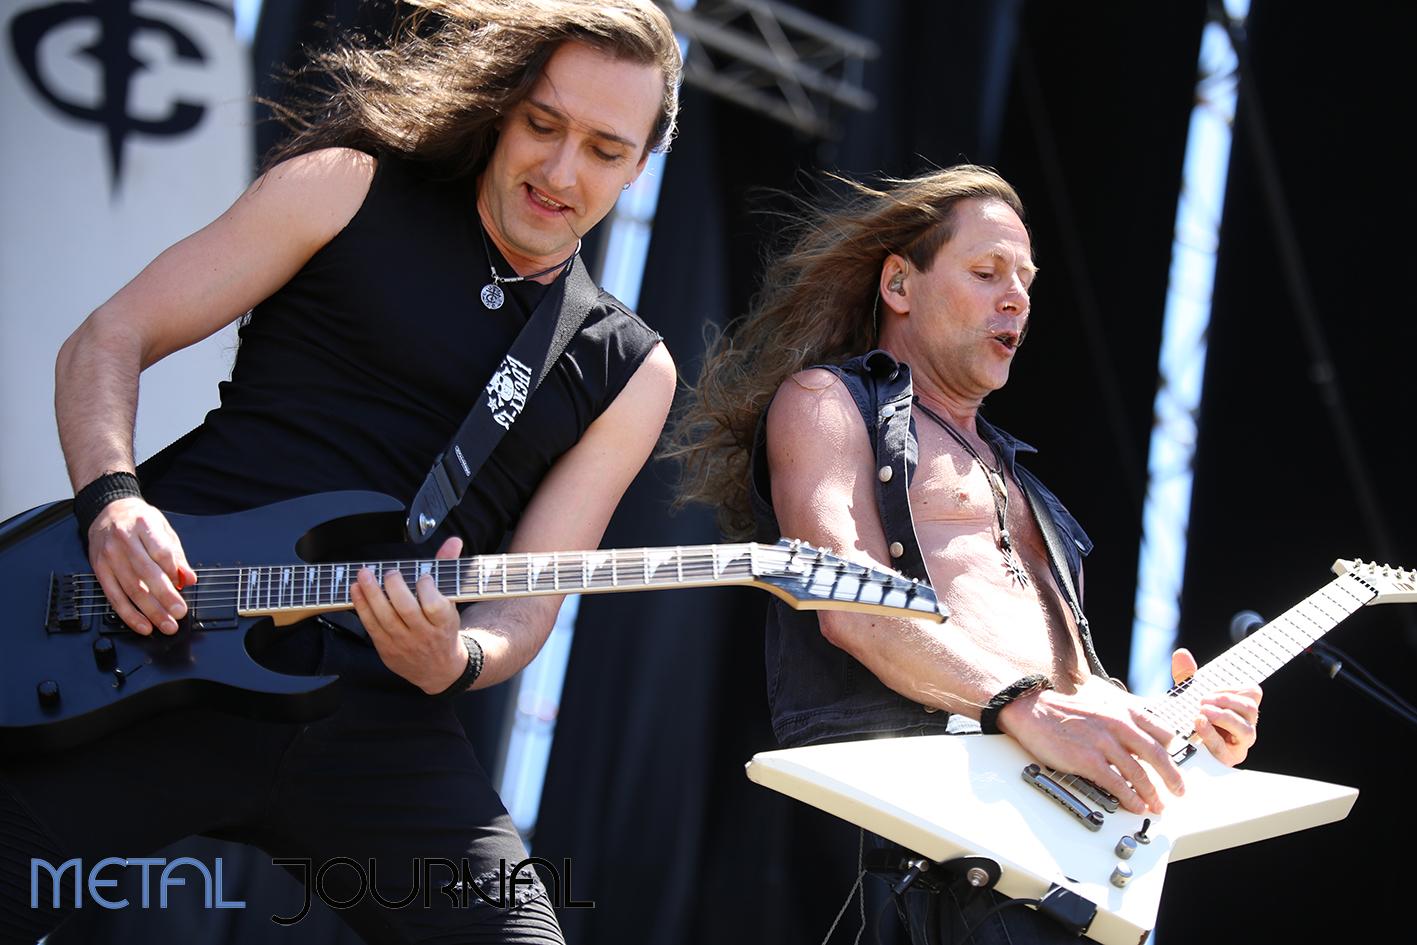 freedom call metal journal rock the coast 2019 pic 5